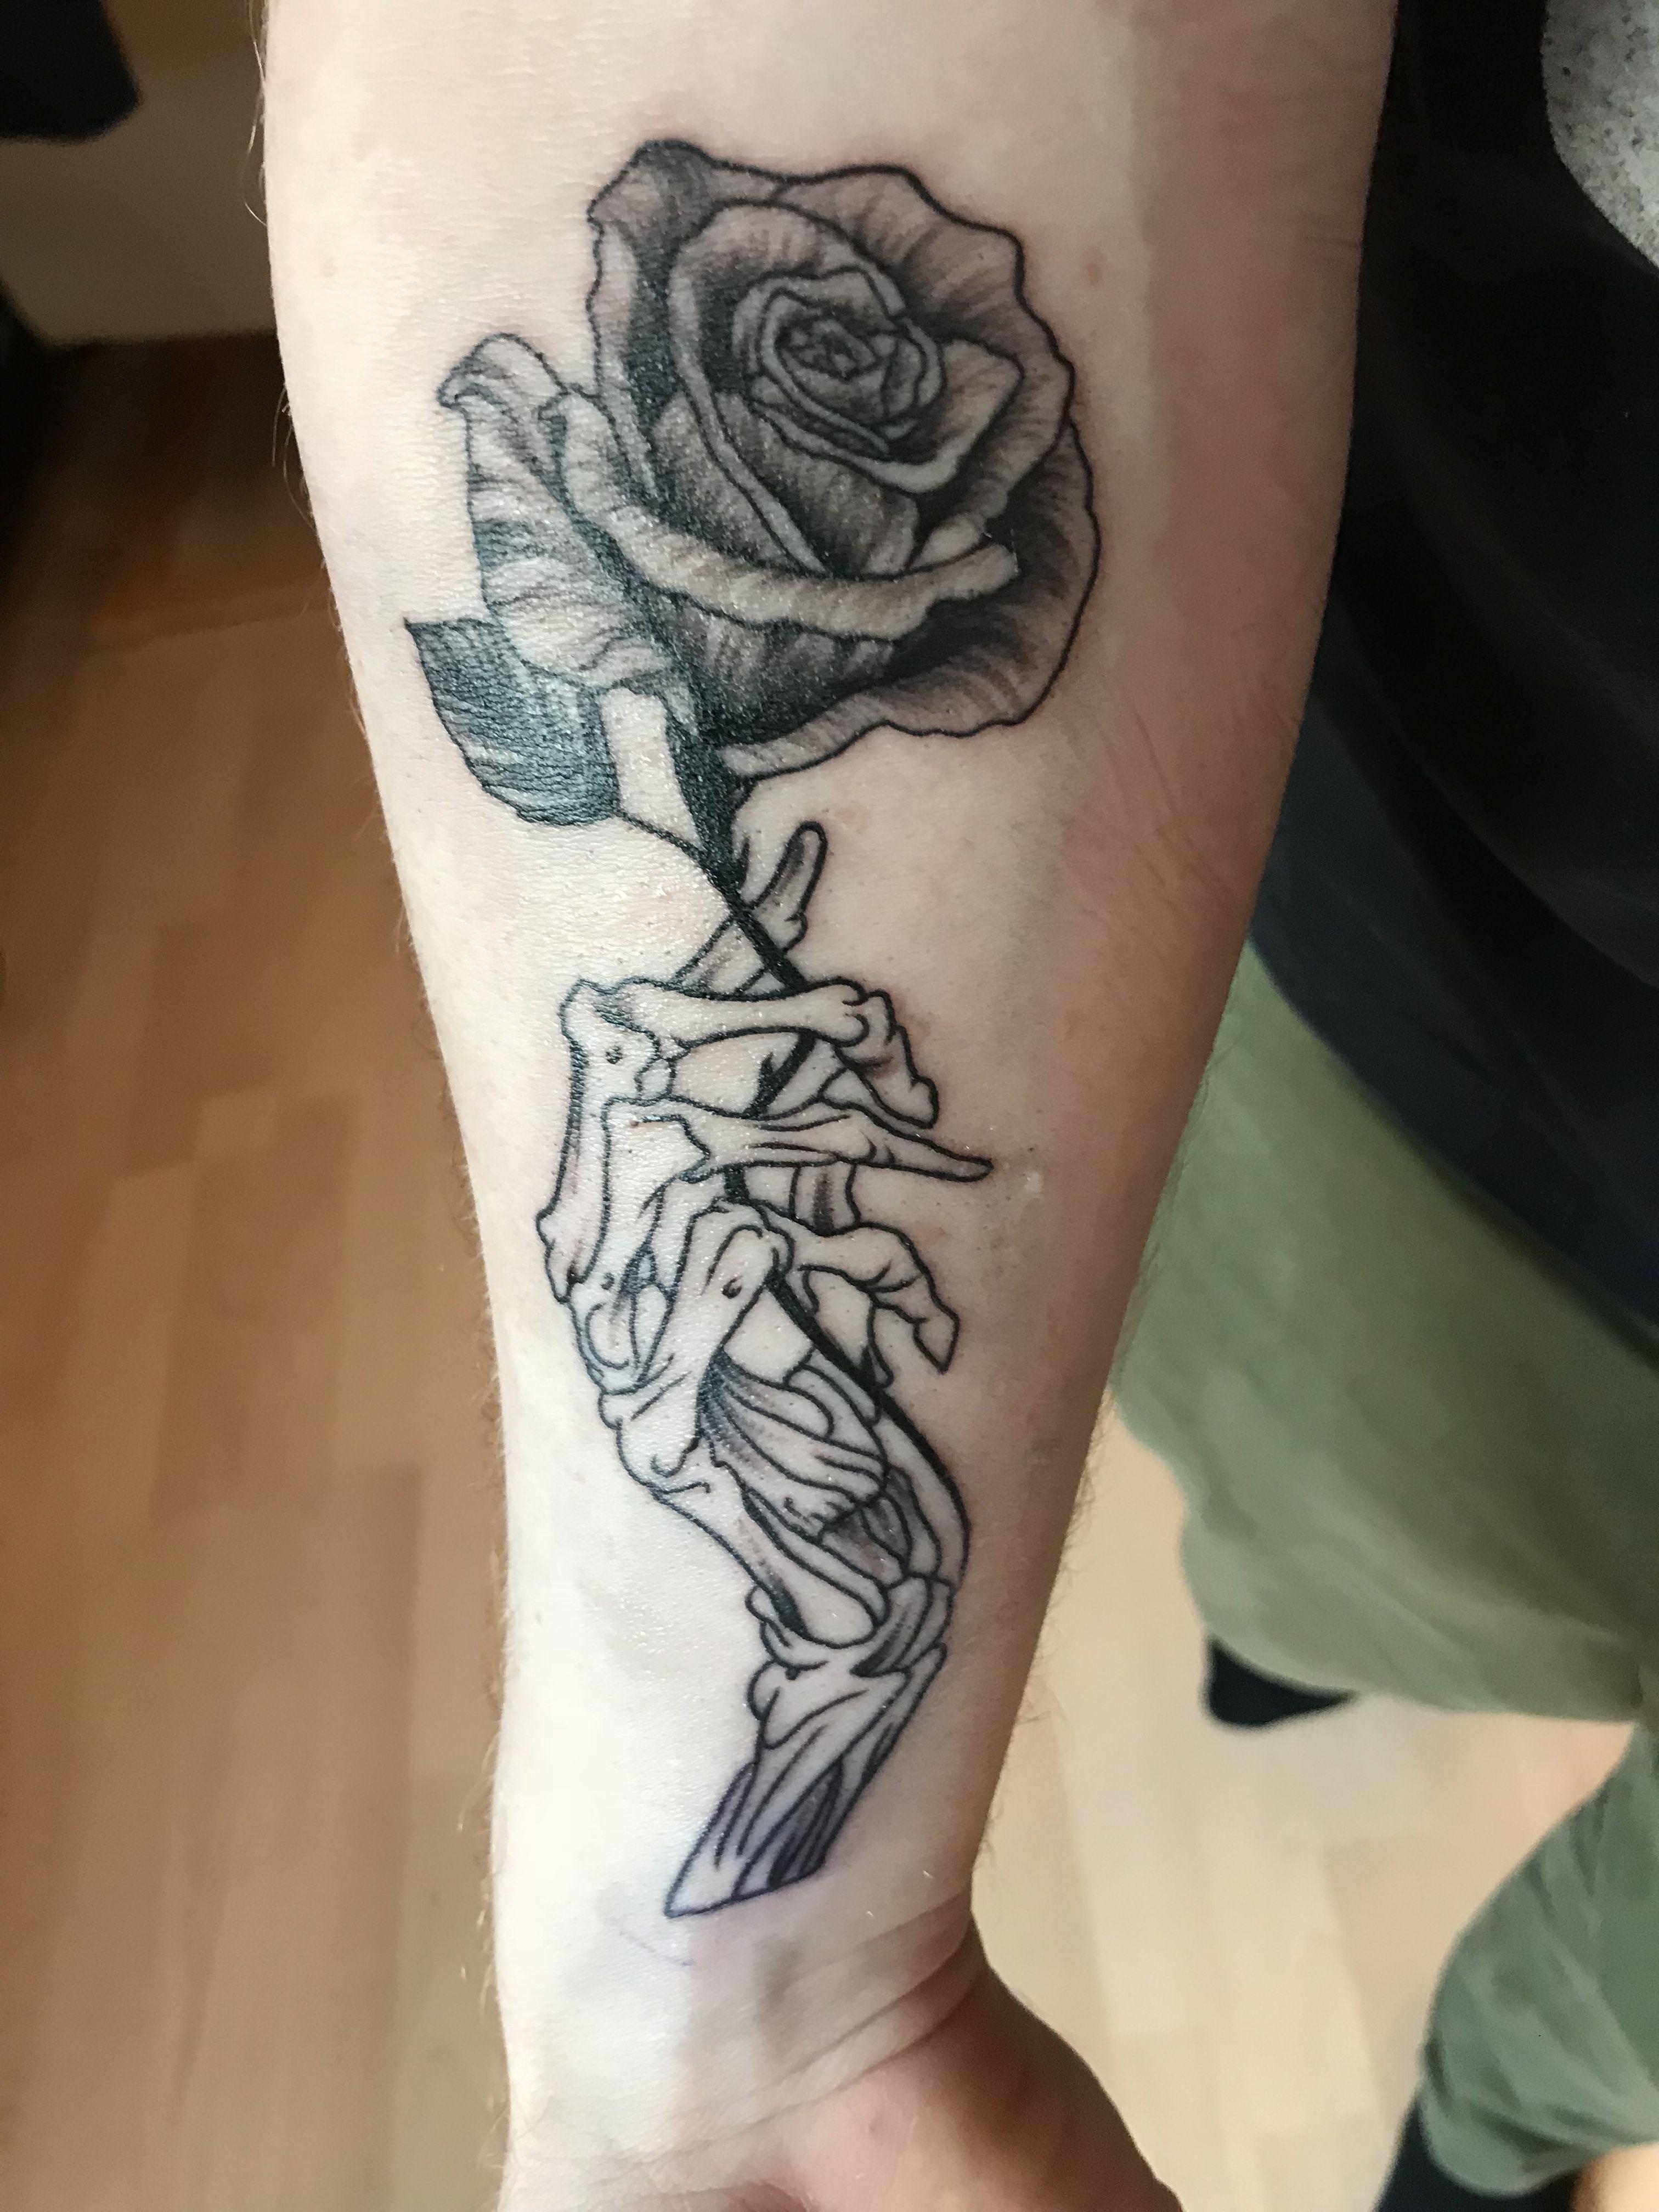 Coco Skelett Hande Temporare Tattoos Fur 4